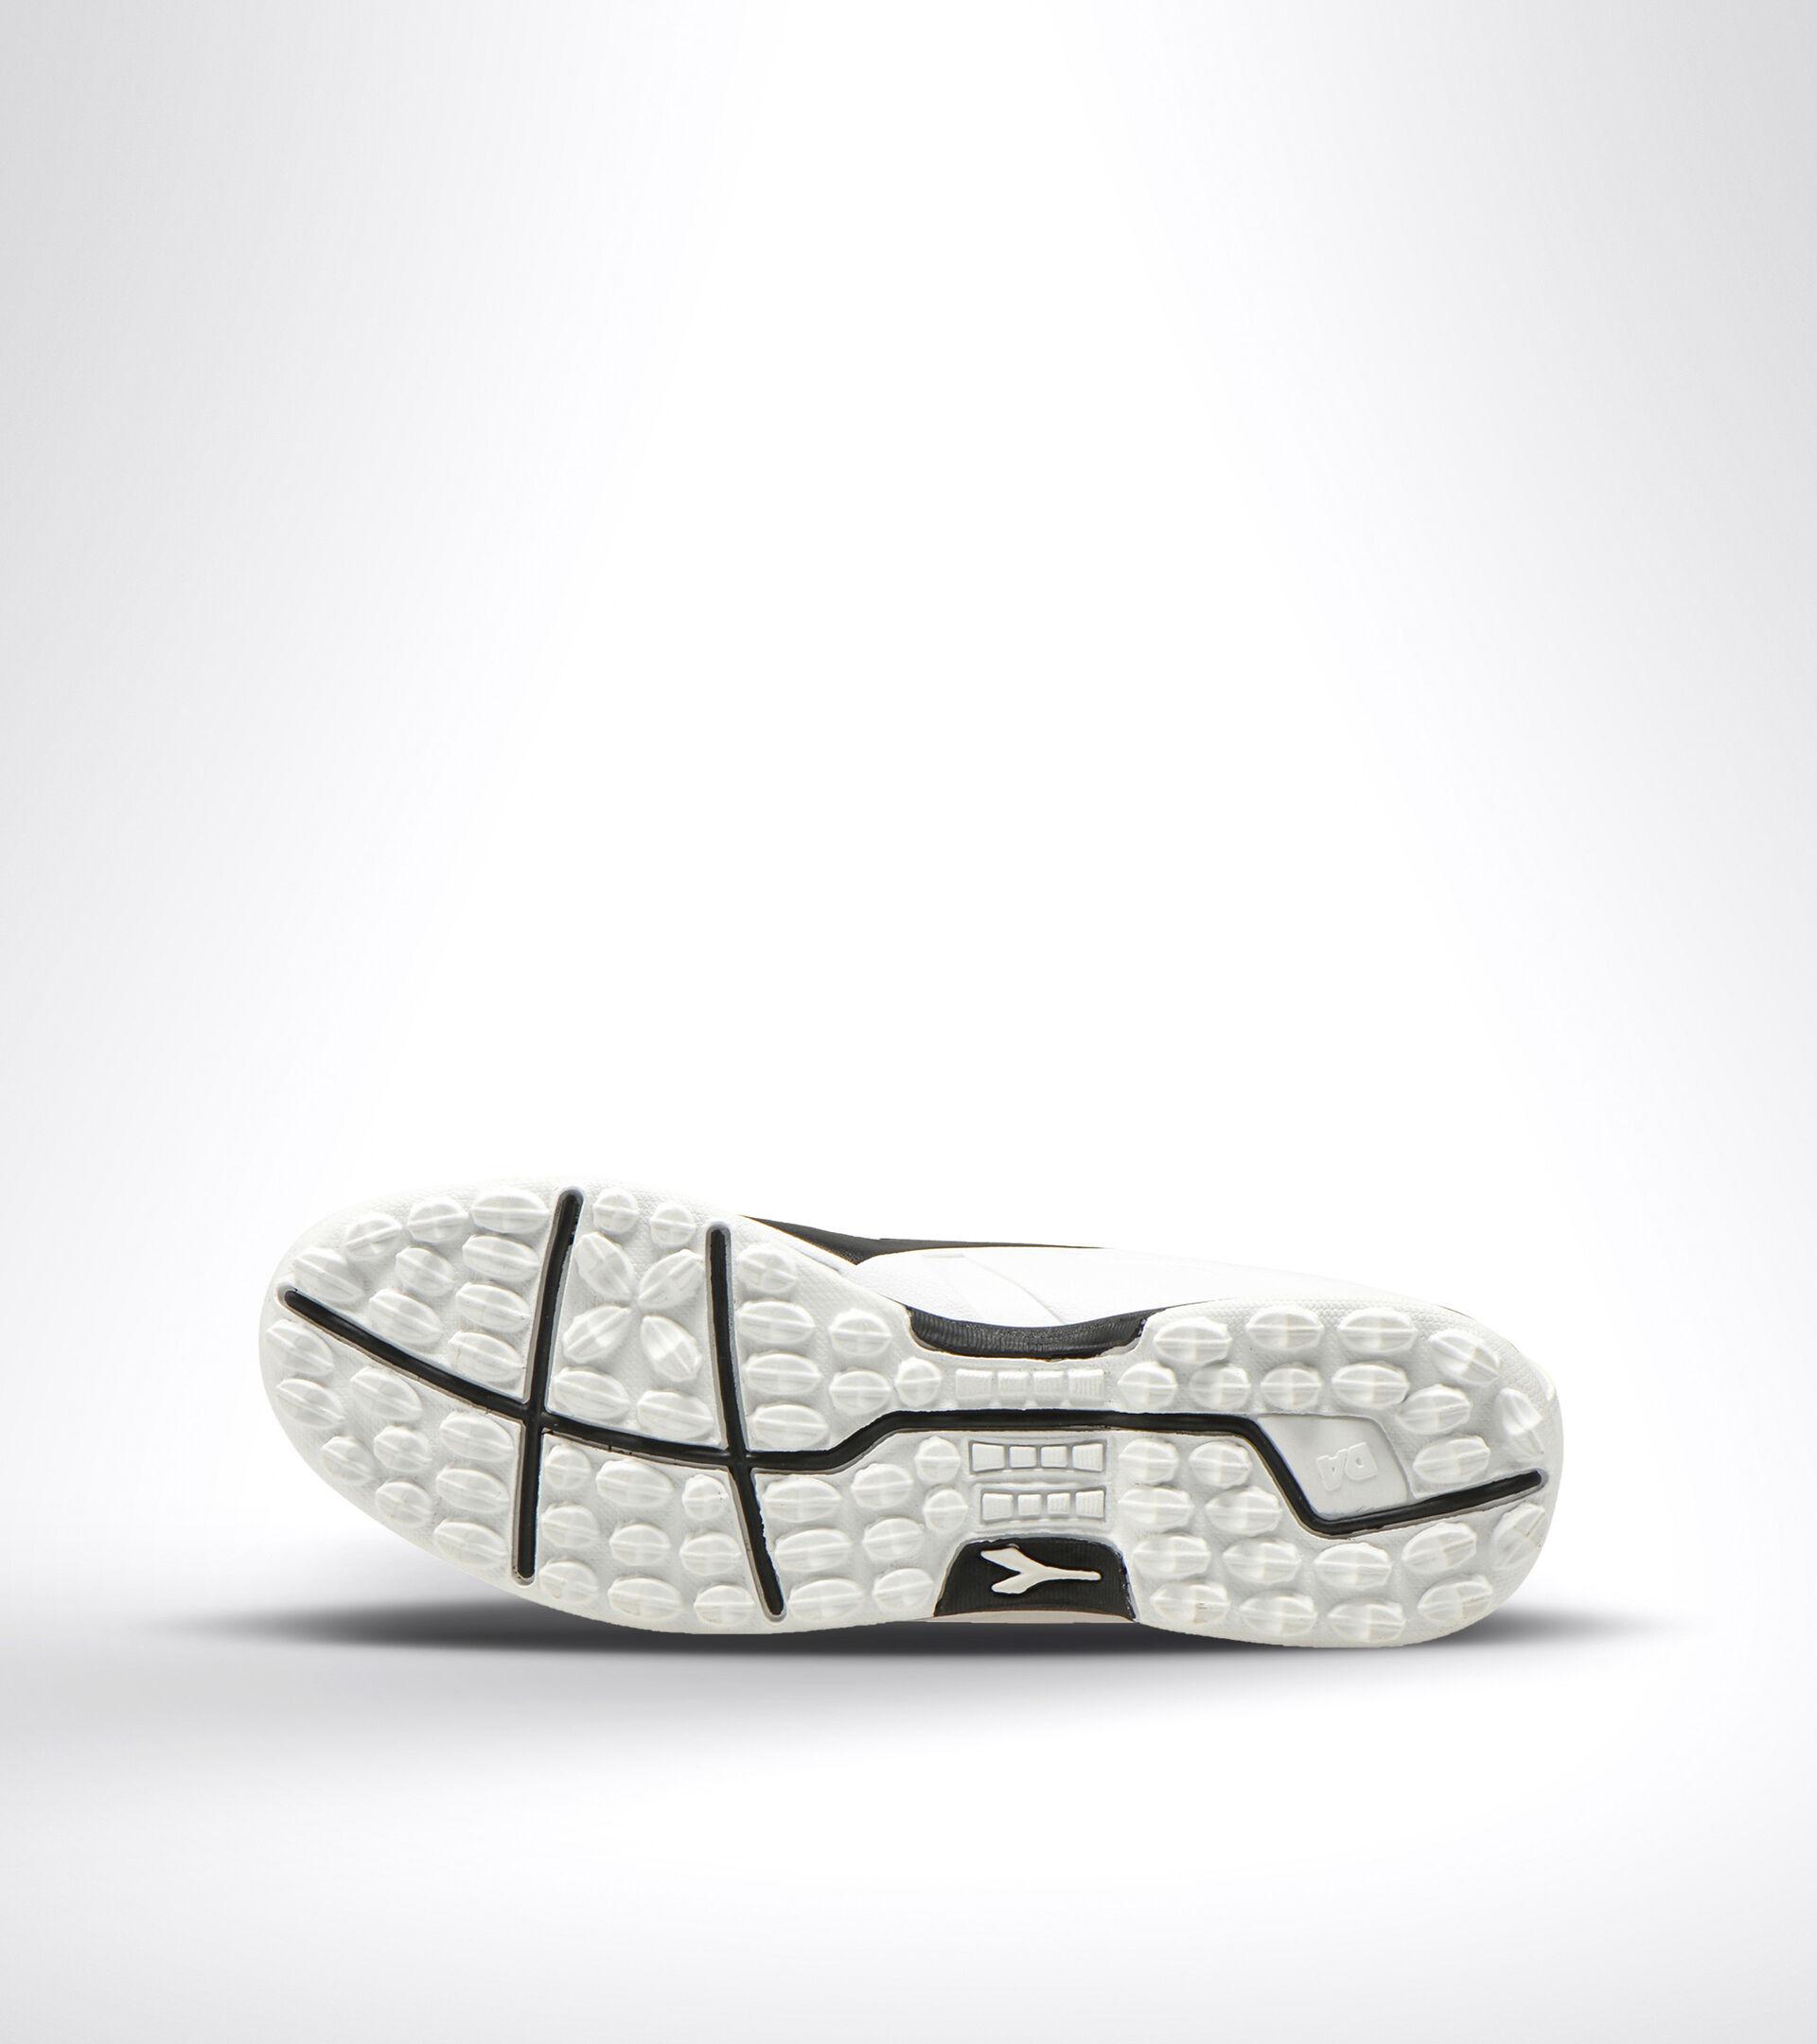 Hard ground and artificial turf football boot PICHICHI 3 TF WHITE/BLACK - Diadora